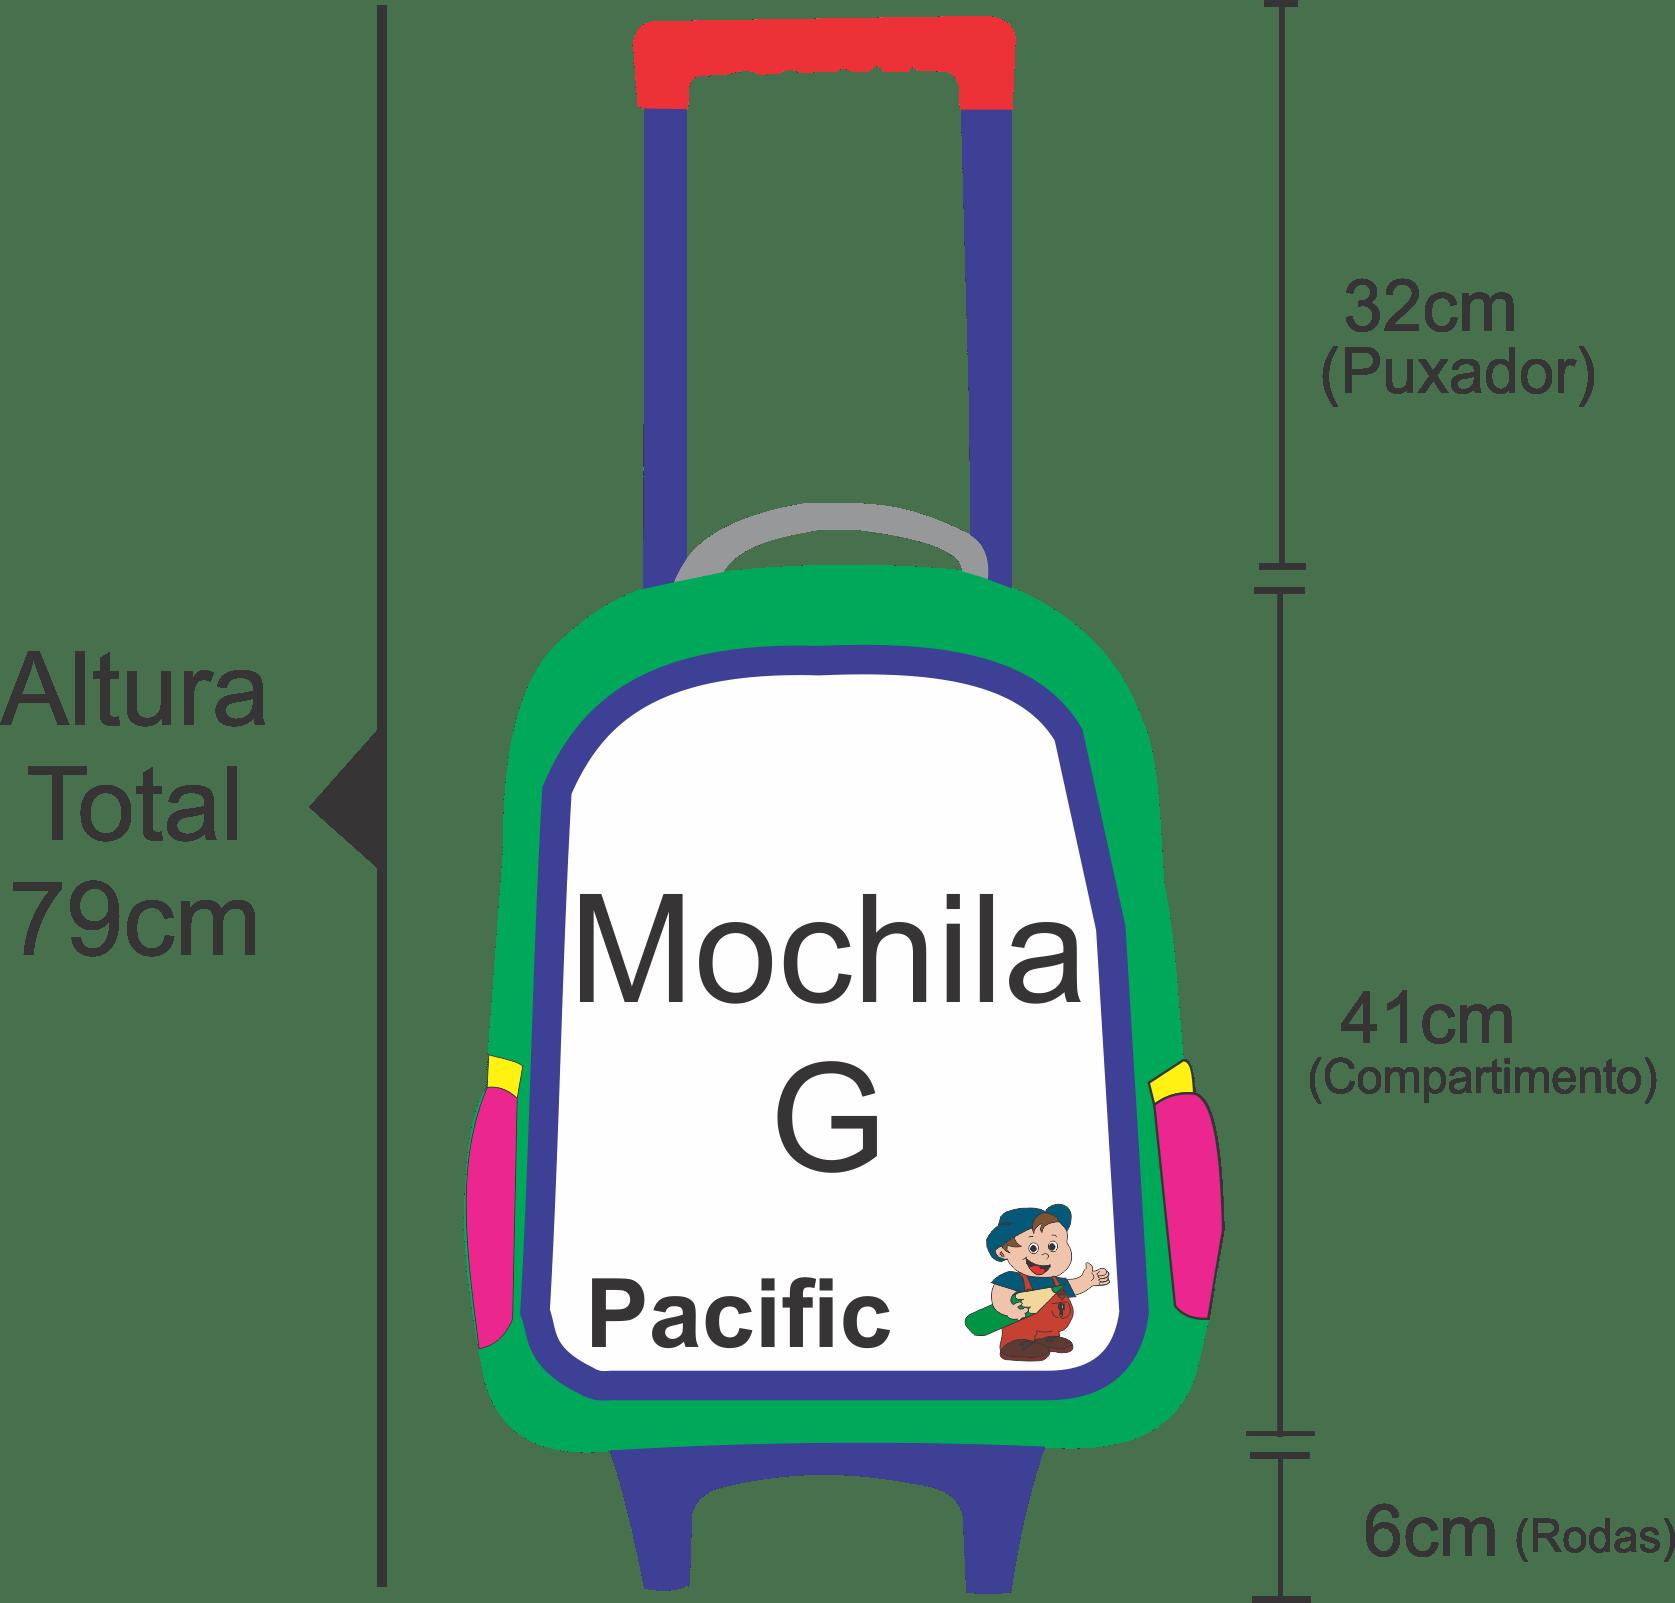 medidas da mochila Miraculous masculina verde